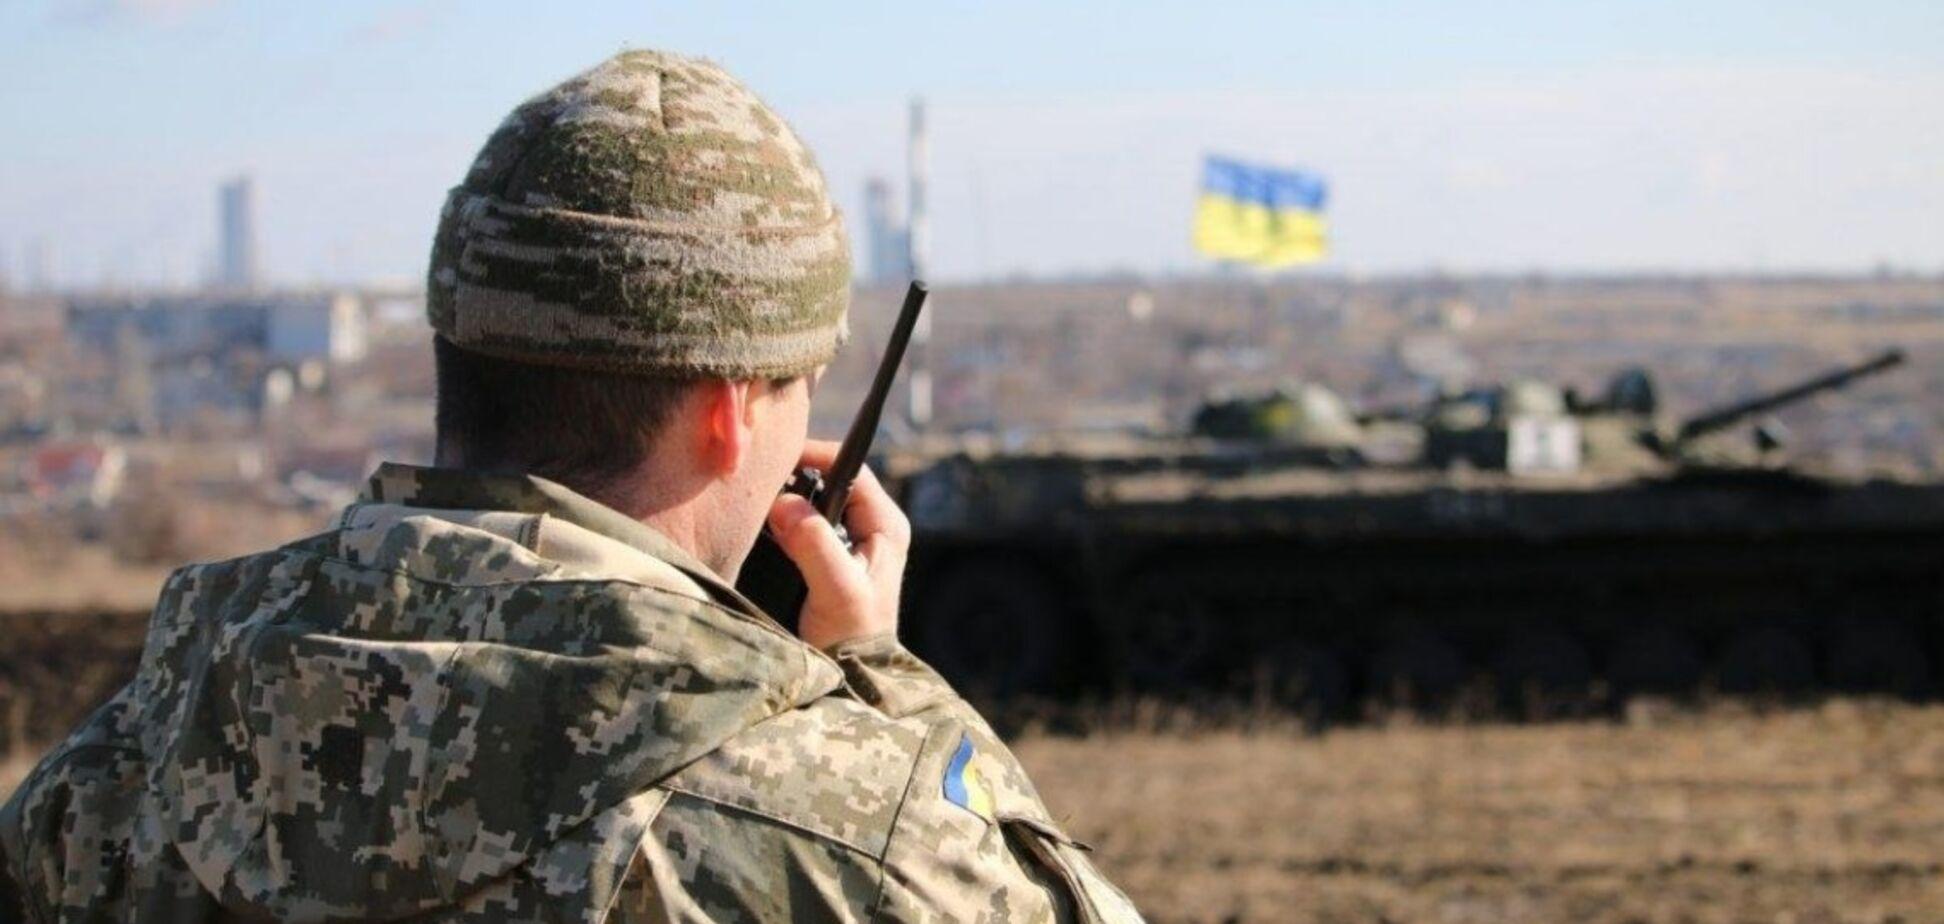 Наемники Путина развязали бои на Донбассе: ВСУ героически держали оборону